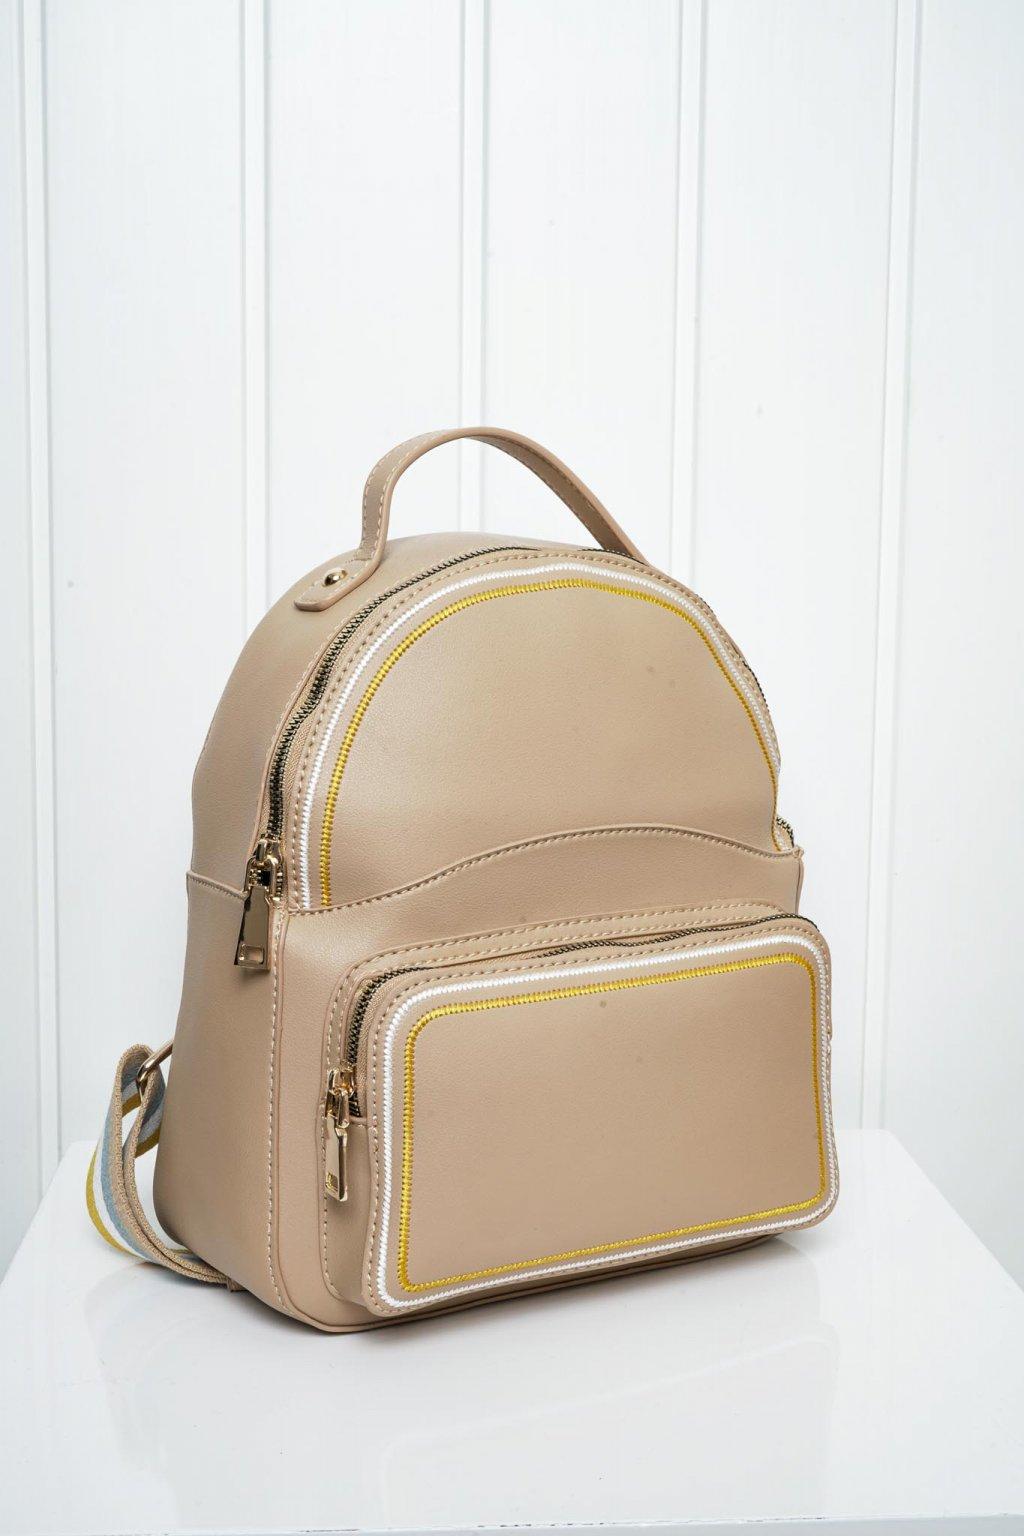 Kabelka, crossbody, ruksak, shopping bag, shopperka, 450